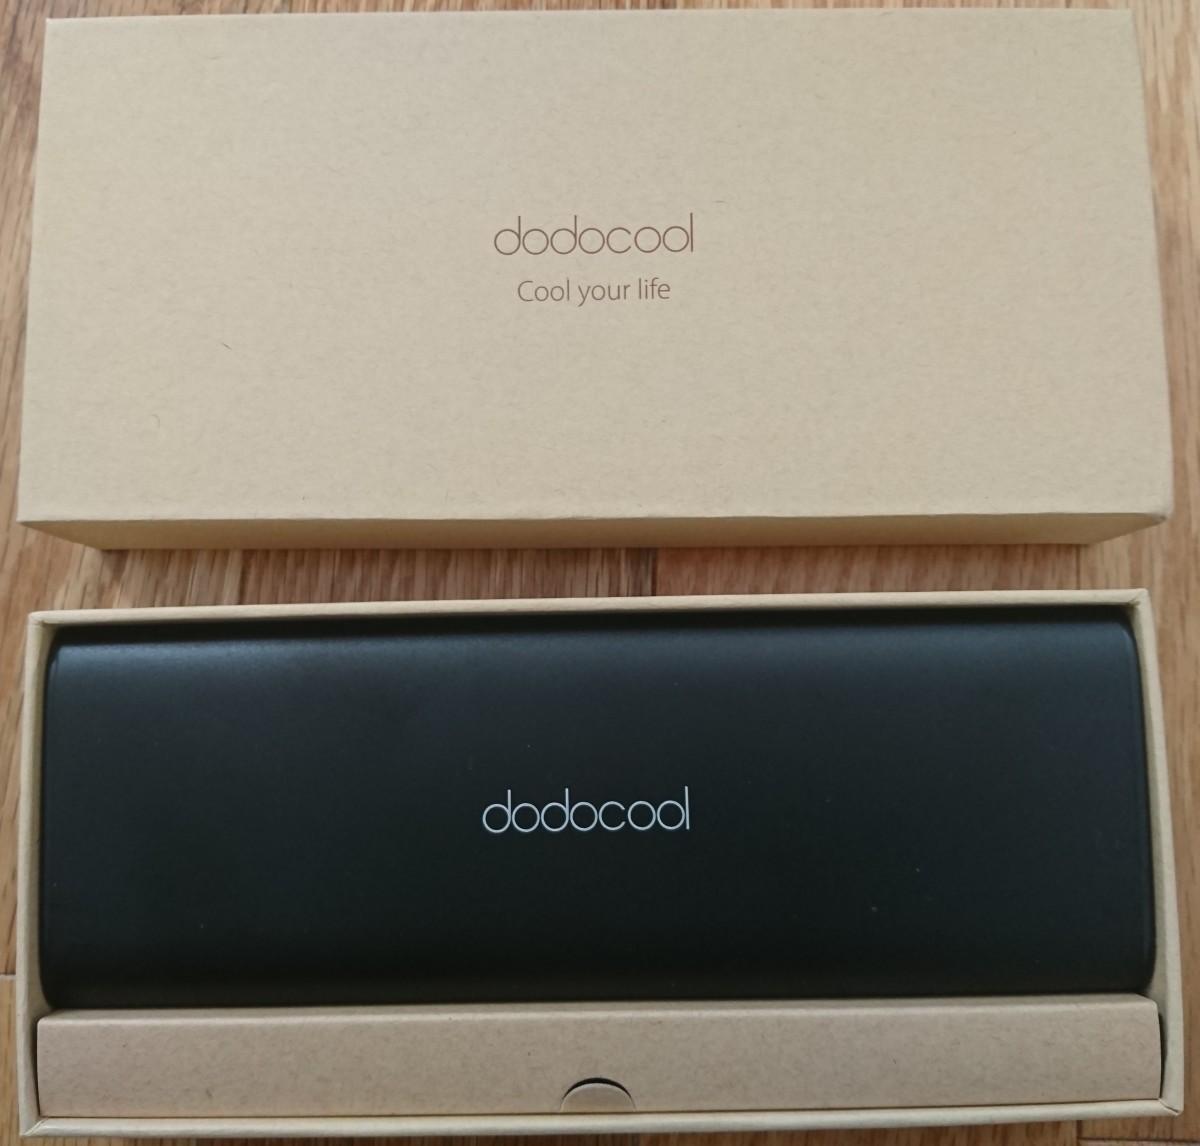 dodocool-dp13-45w-20-000-mah-usb-c-pd-power-bank-review